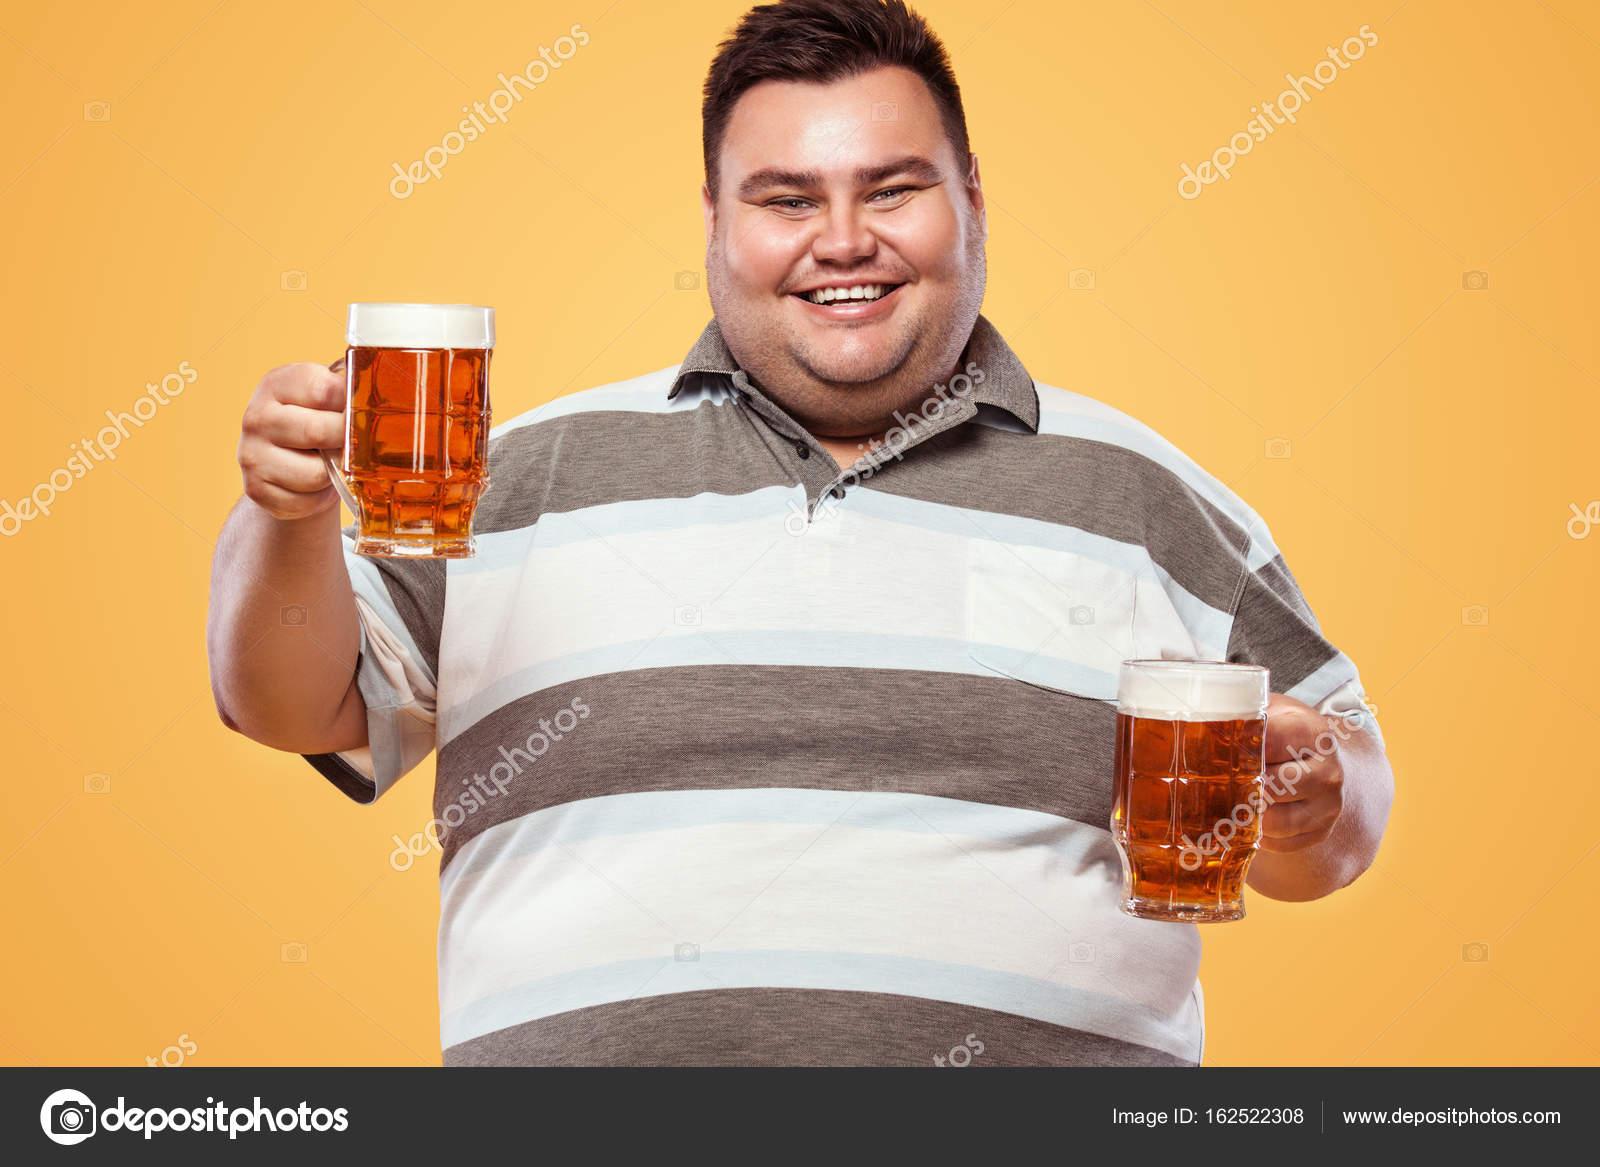 1ère simulation Depositphotos_162522308-stock-photo-young-fat-man-at-oktoberfest